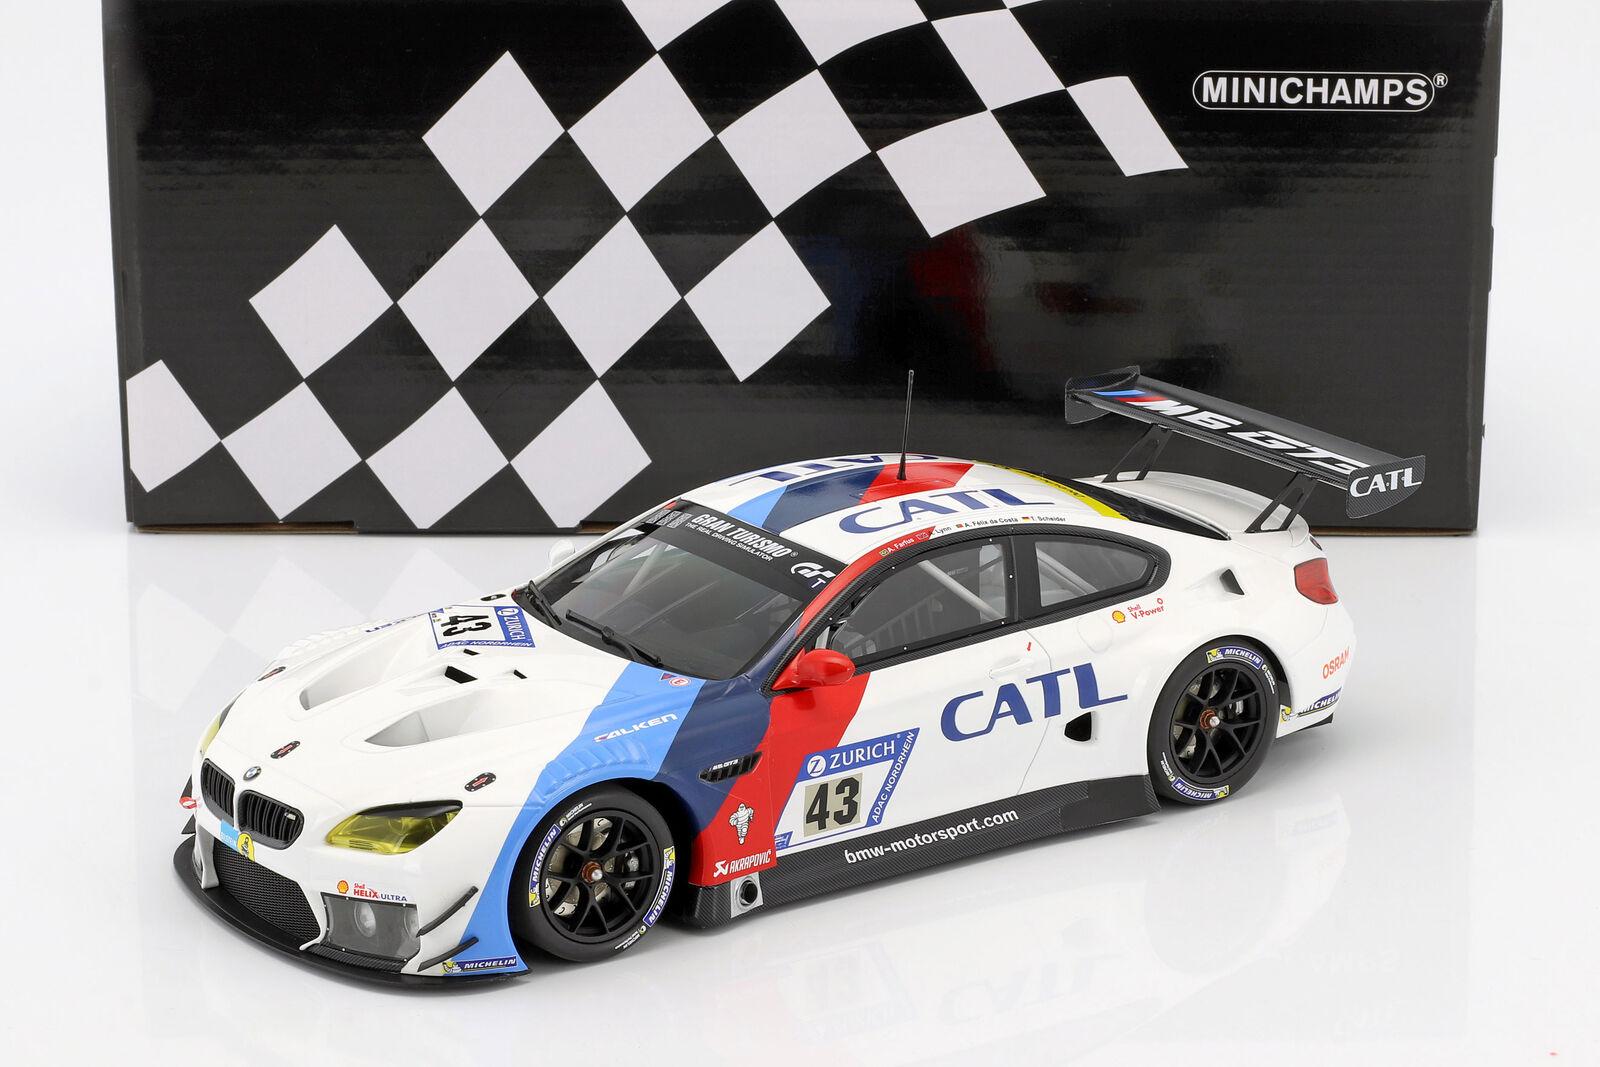 BMW M6 Gt3 h Nürburgring 2017 Farfus, Lynn, Da Costa, Scheider 1 18 Minic